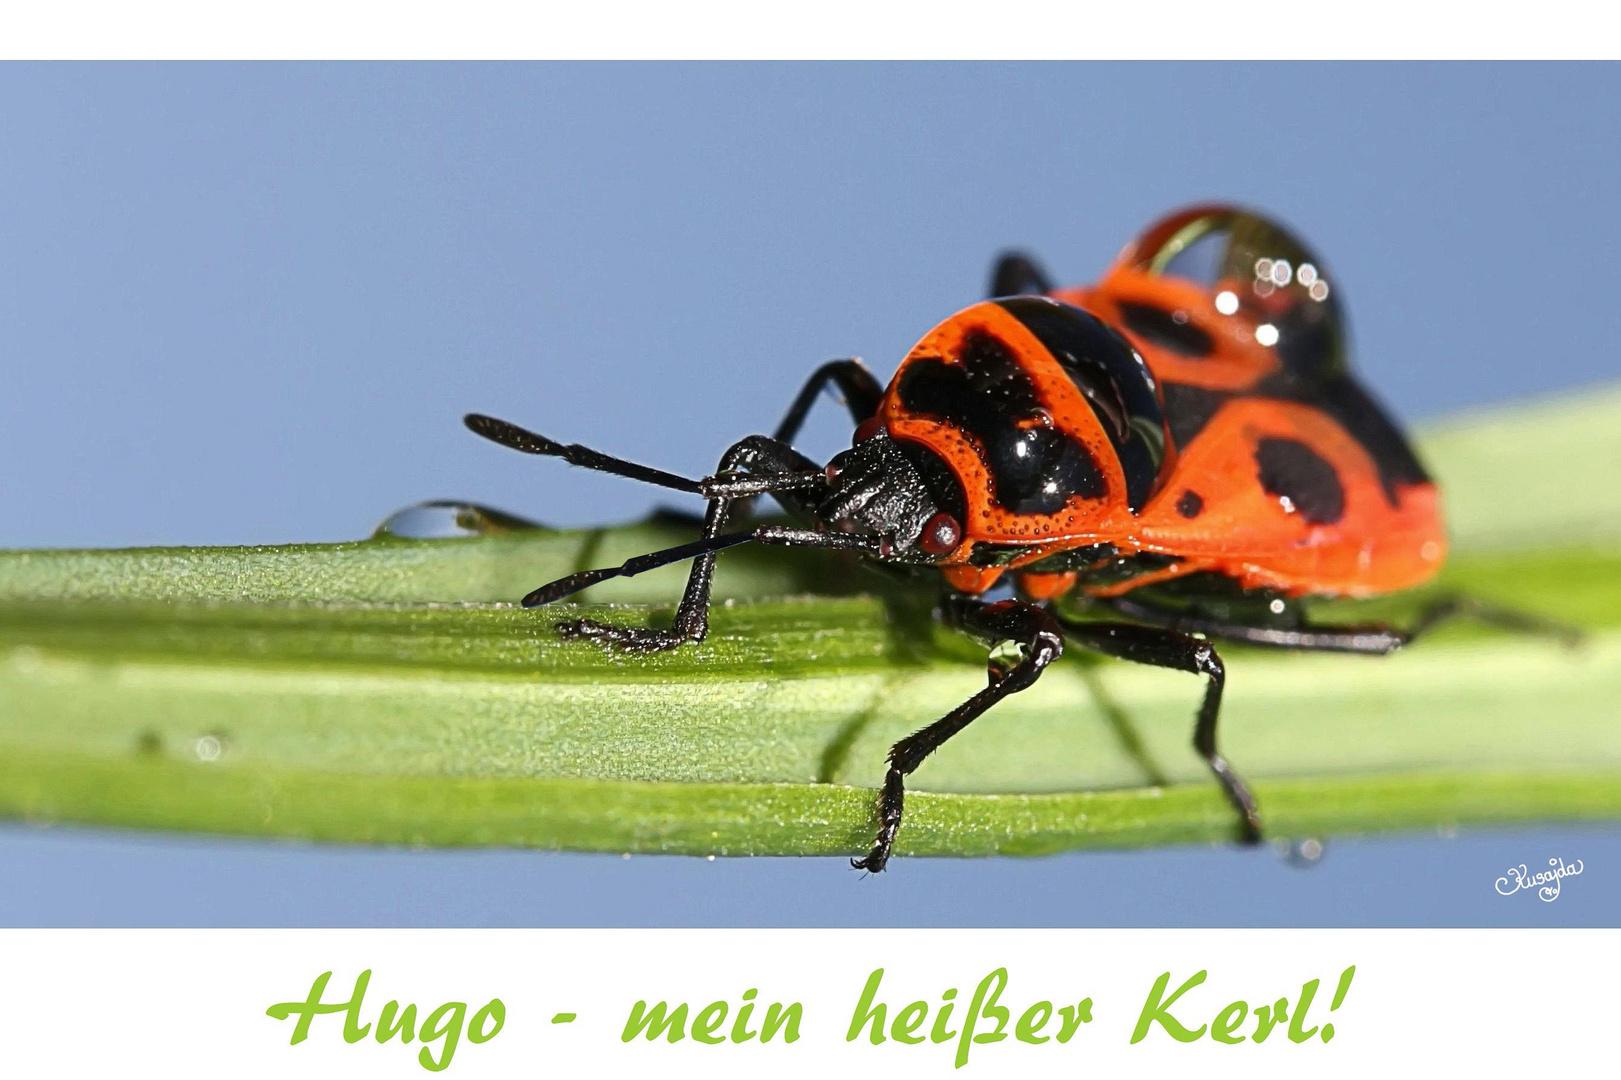 Hugo - mein heißer Kerl!